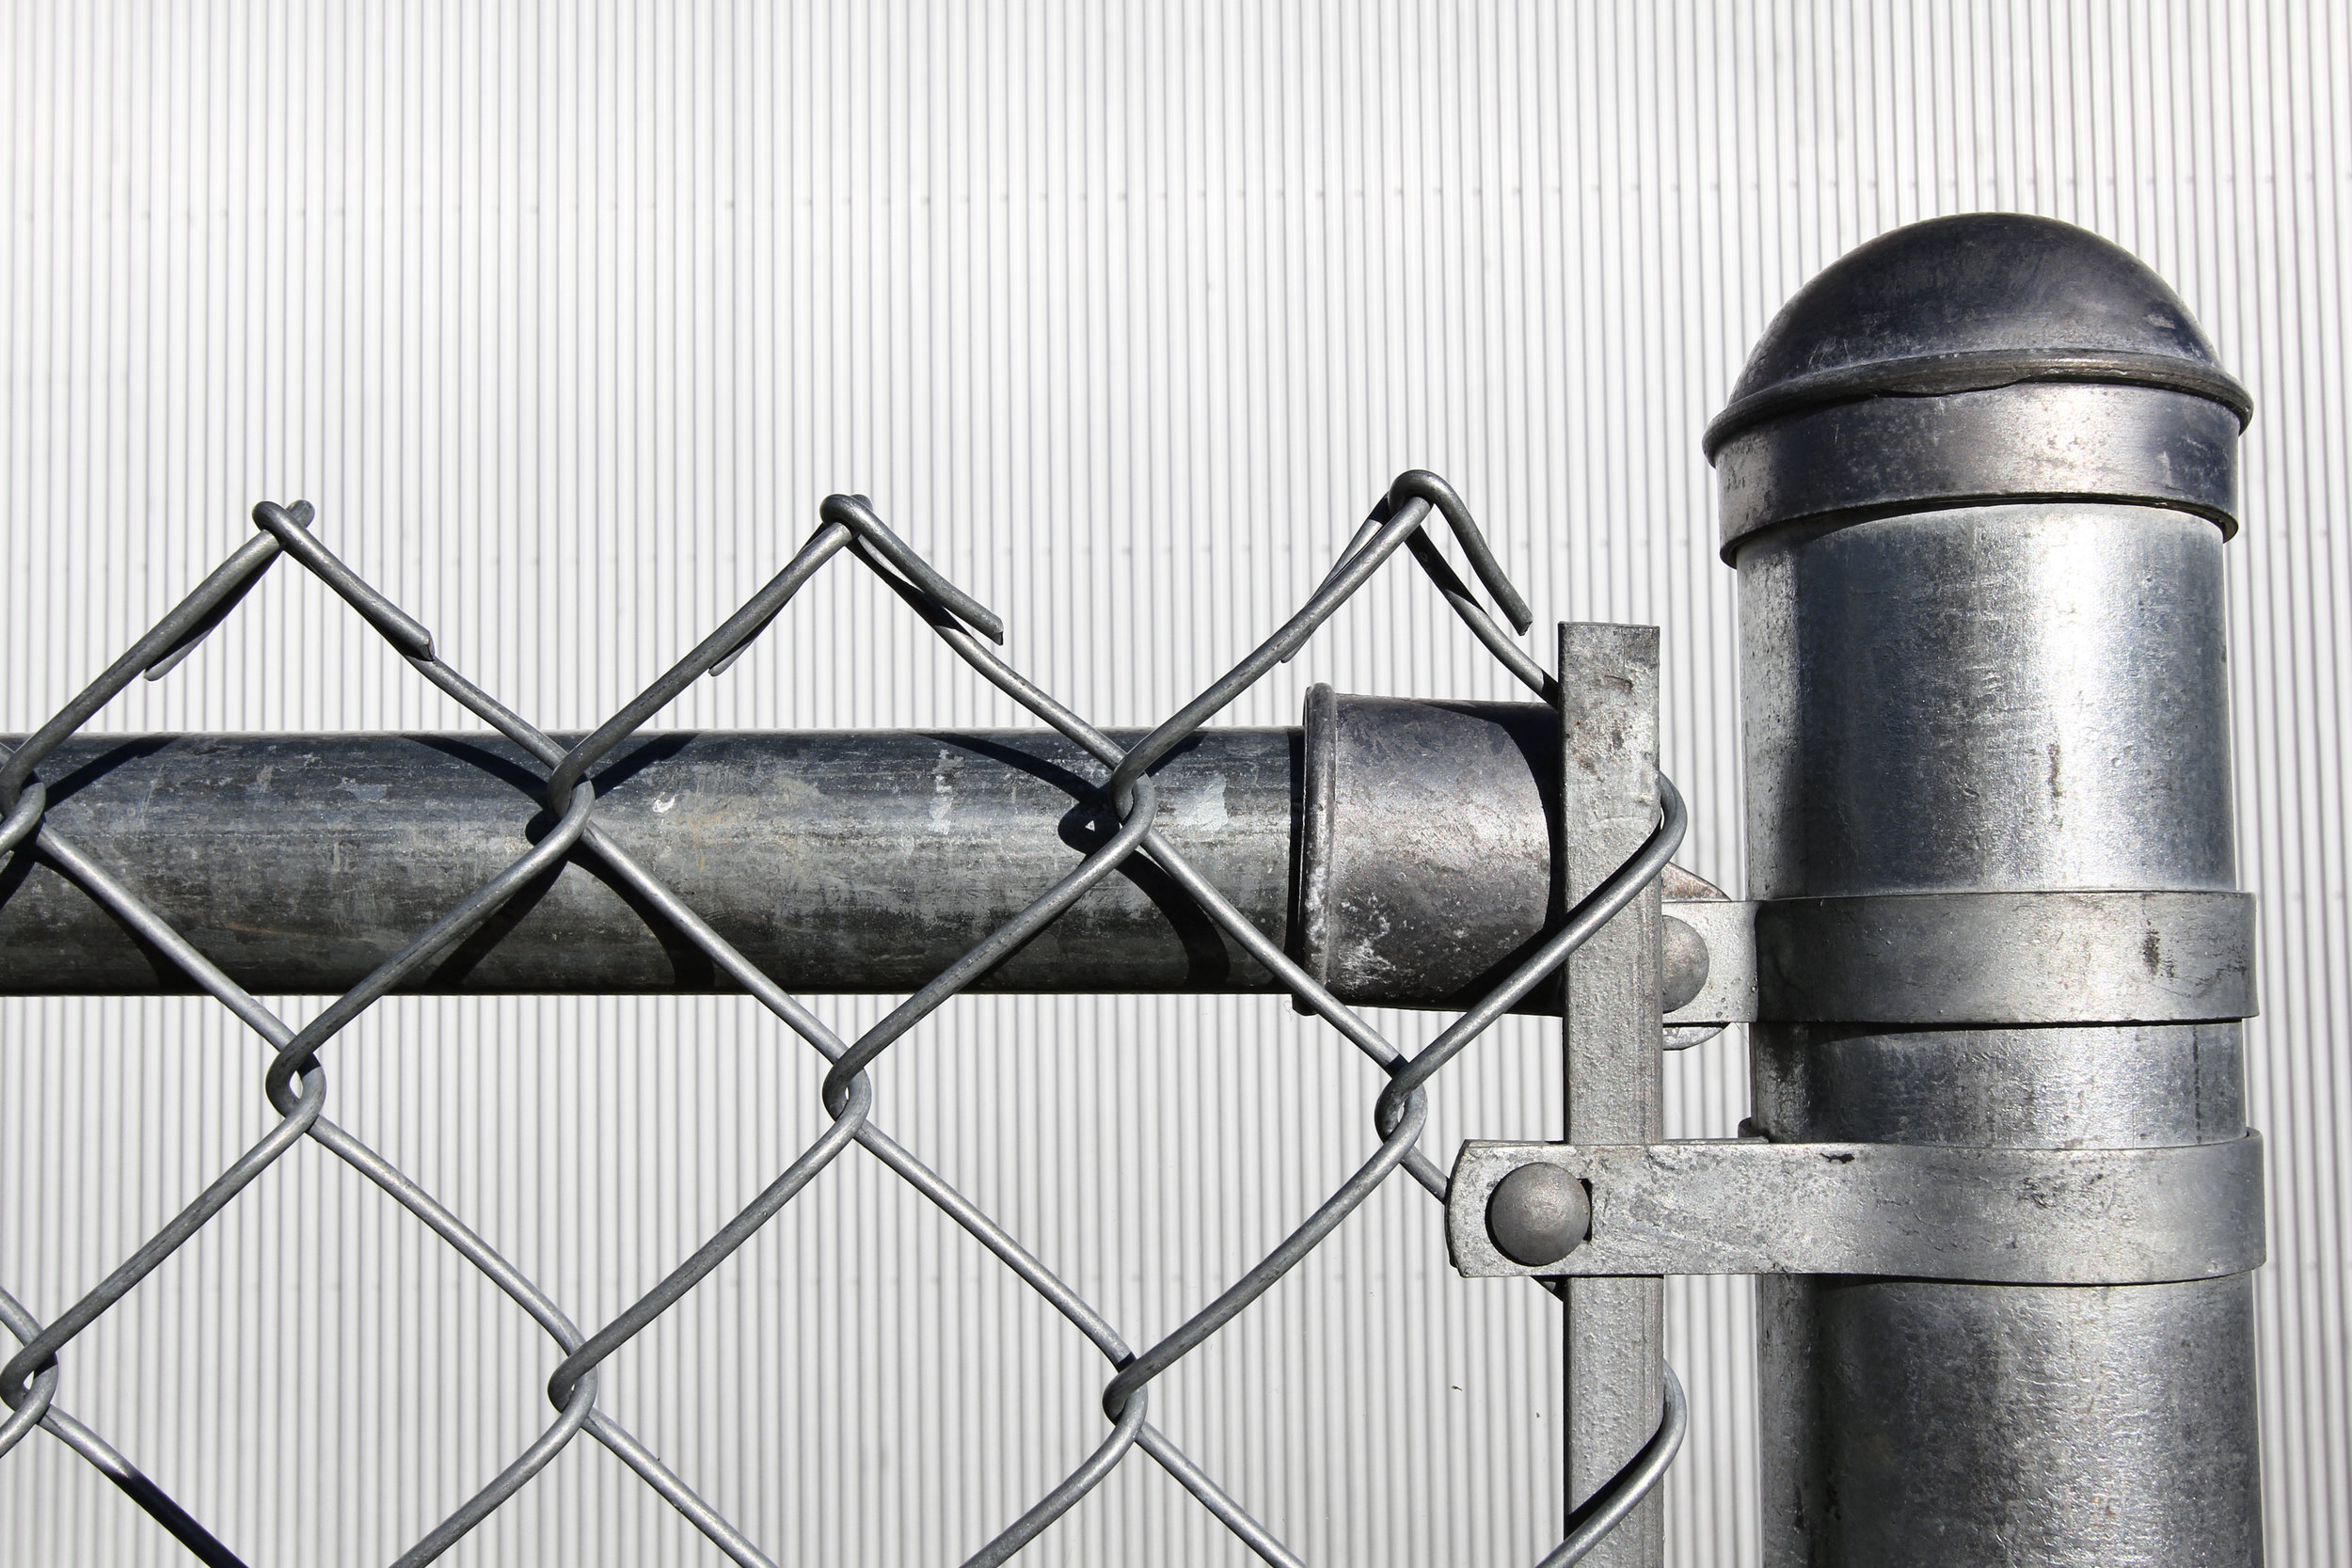 Chain Link Fence Keller Texas.jpg